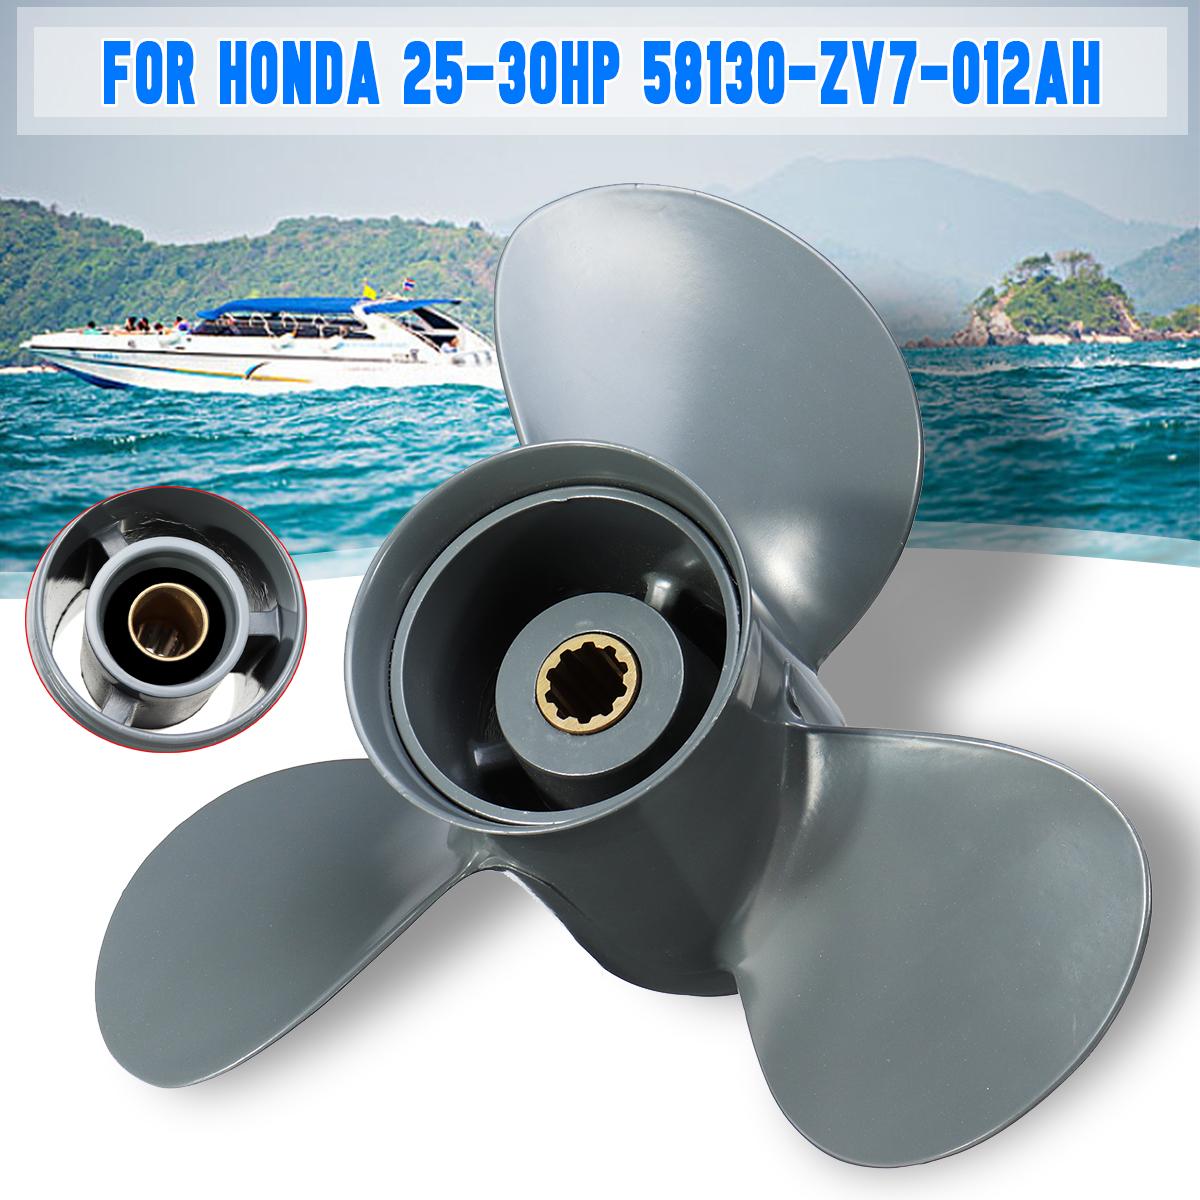 9 7/8 x 12 Aluminum Boat Outboard Propeller For Honda 25-30HP 58130-ZV7-012AH